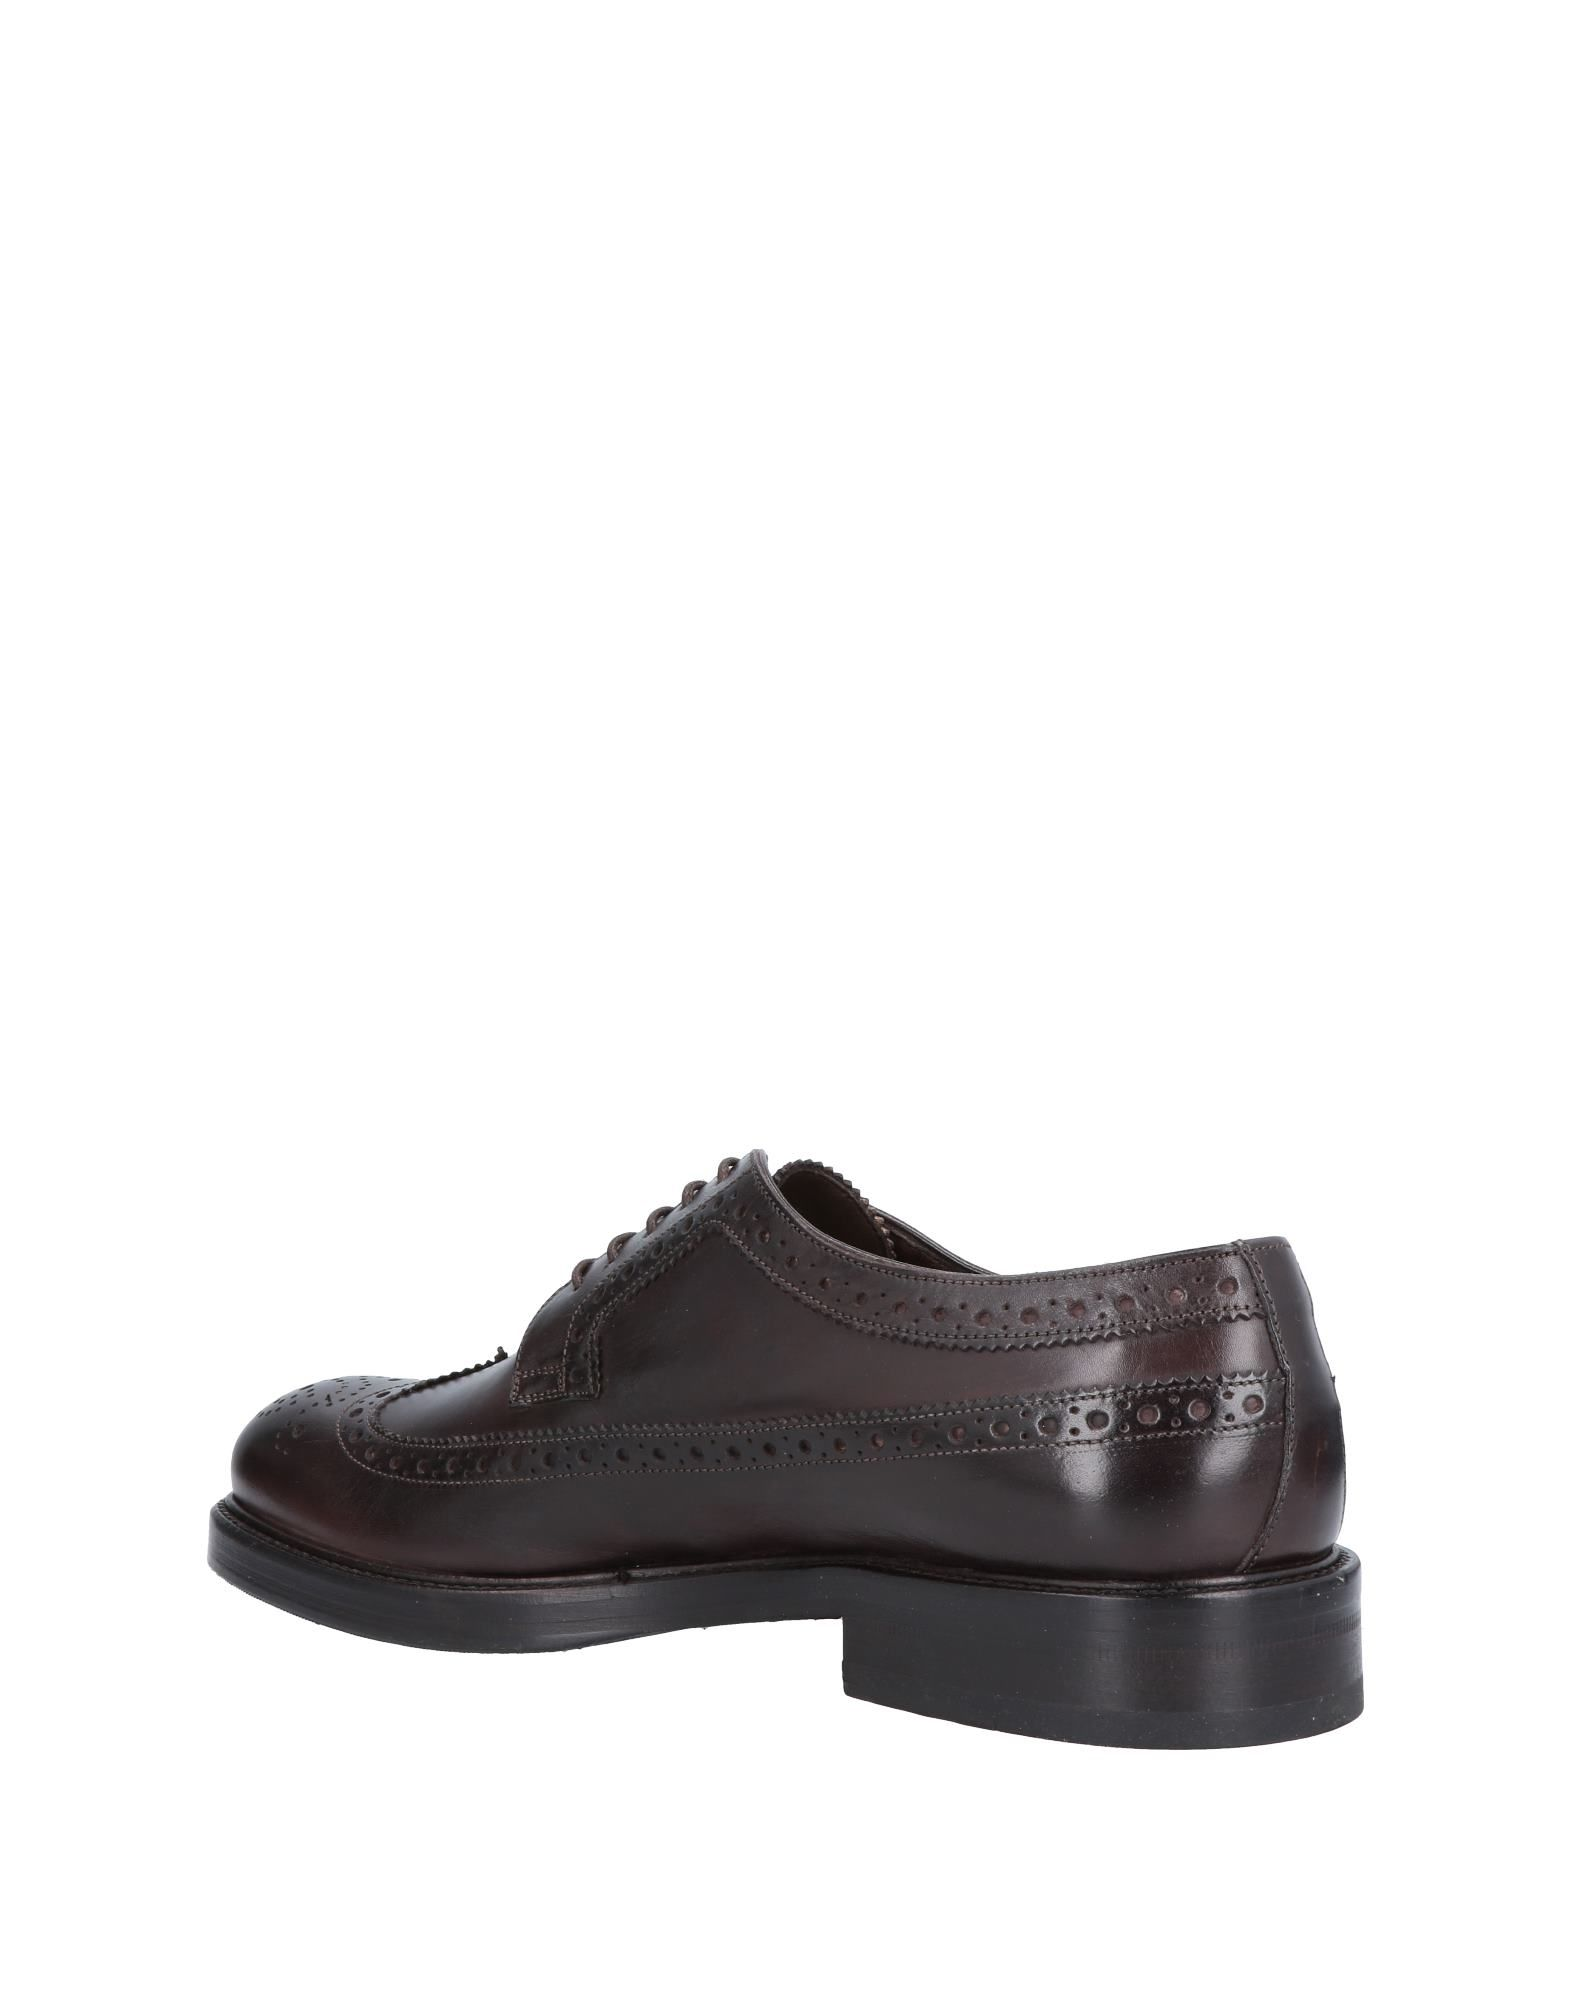 Rabatt Wilton echte Schuhe Jerold Wilton Rabatt Schnürschuhe Herren  11480442QP 2492f5